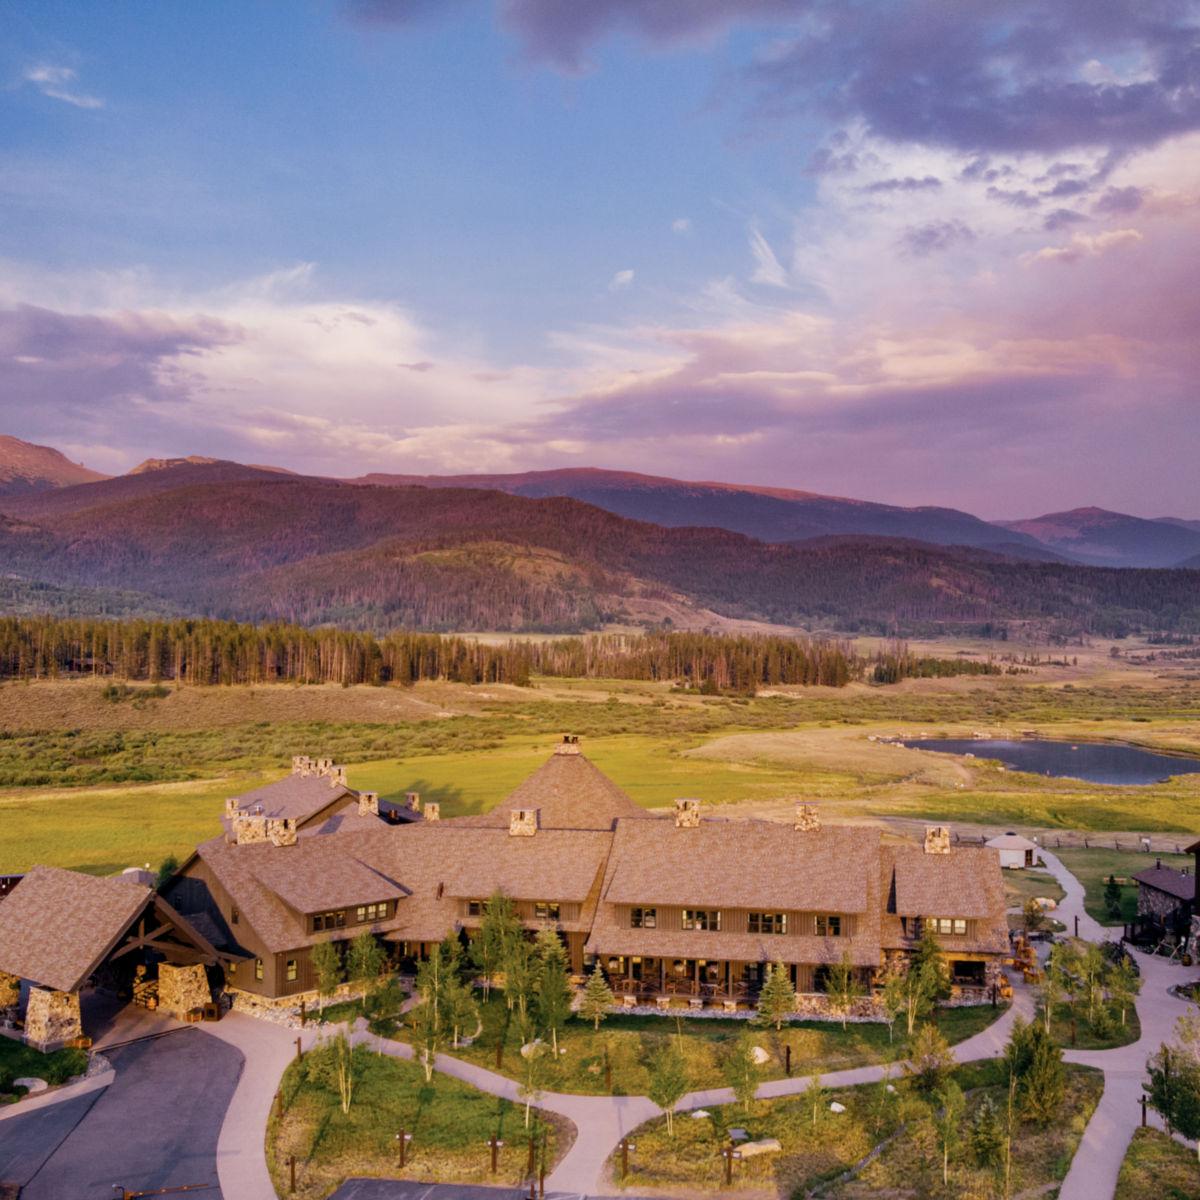 Devil's Thumb Ranch Resort & Spa - image number 0